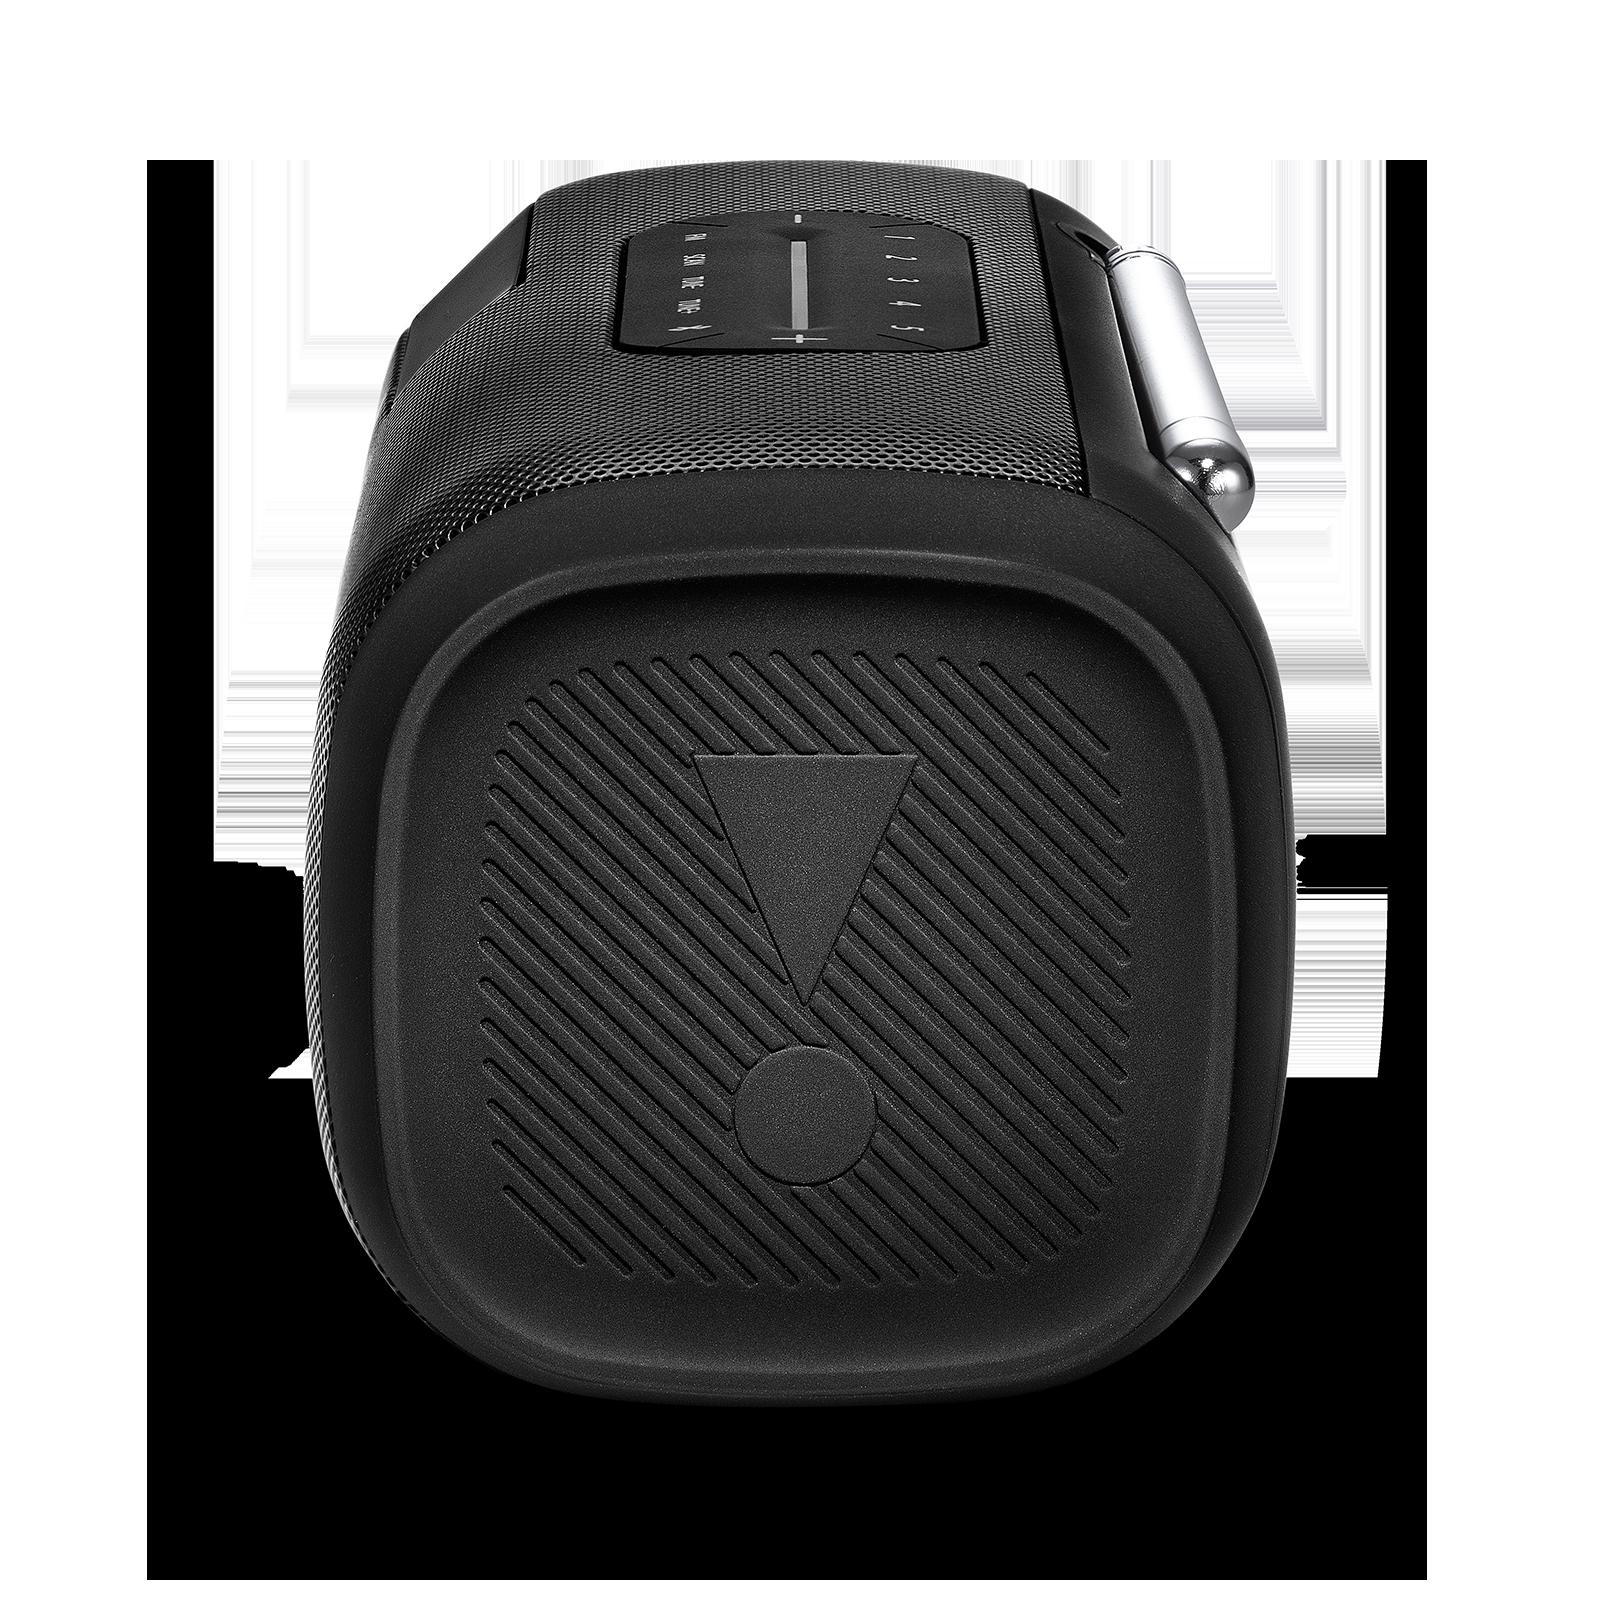 JBL Tuner - Black - Portable Bluetooth Speaker with DAB/FM radio - Detailshot 1